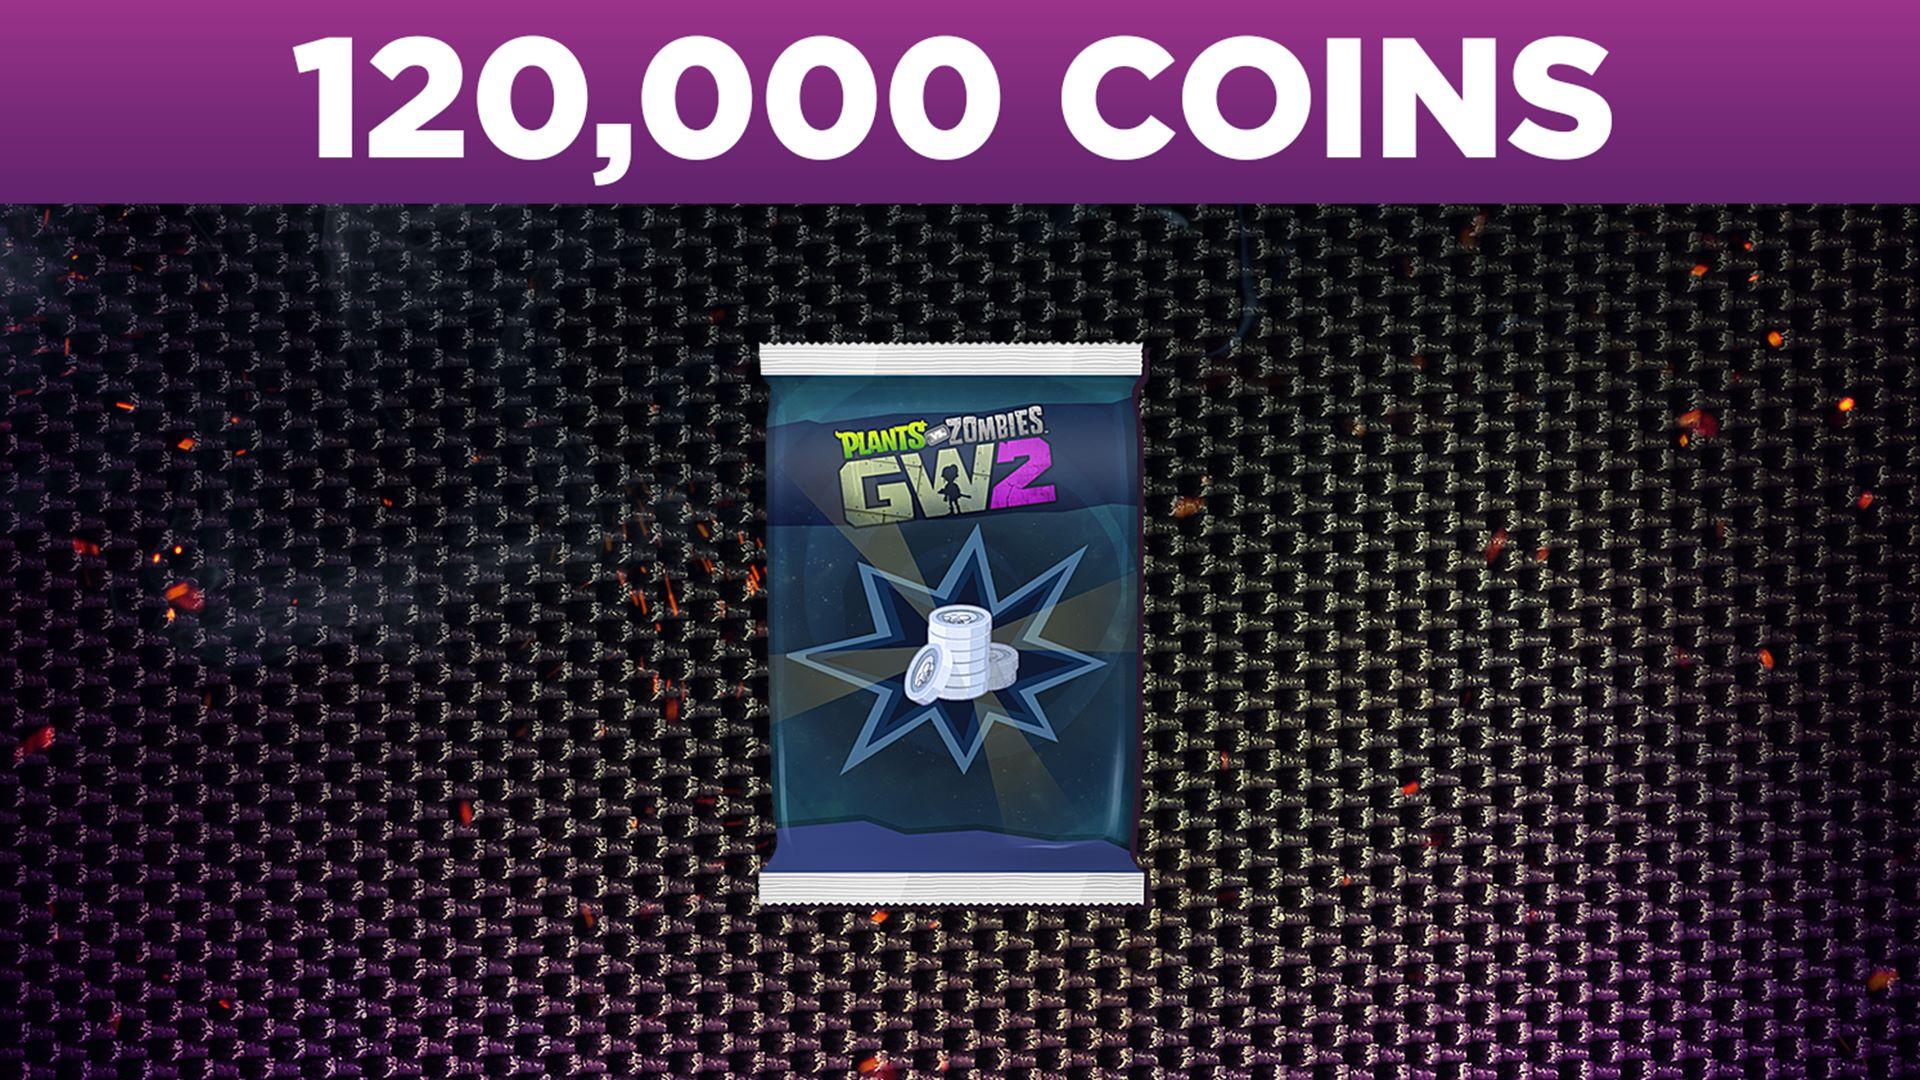 Plants vs. Zombies™ Garden Warfare 2: 120,000 Modest Coins Pack